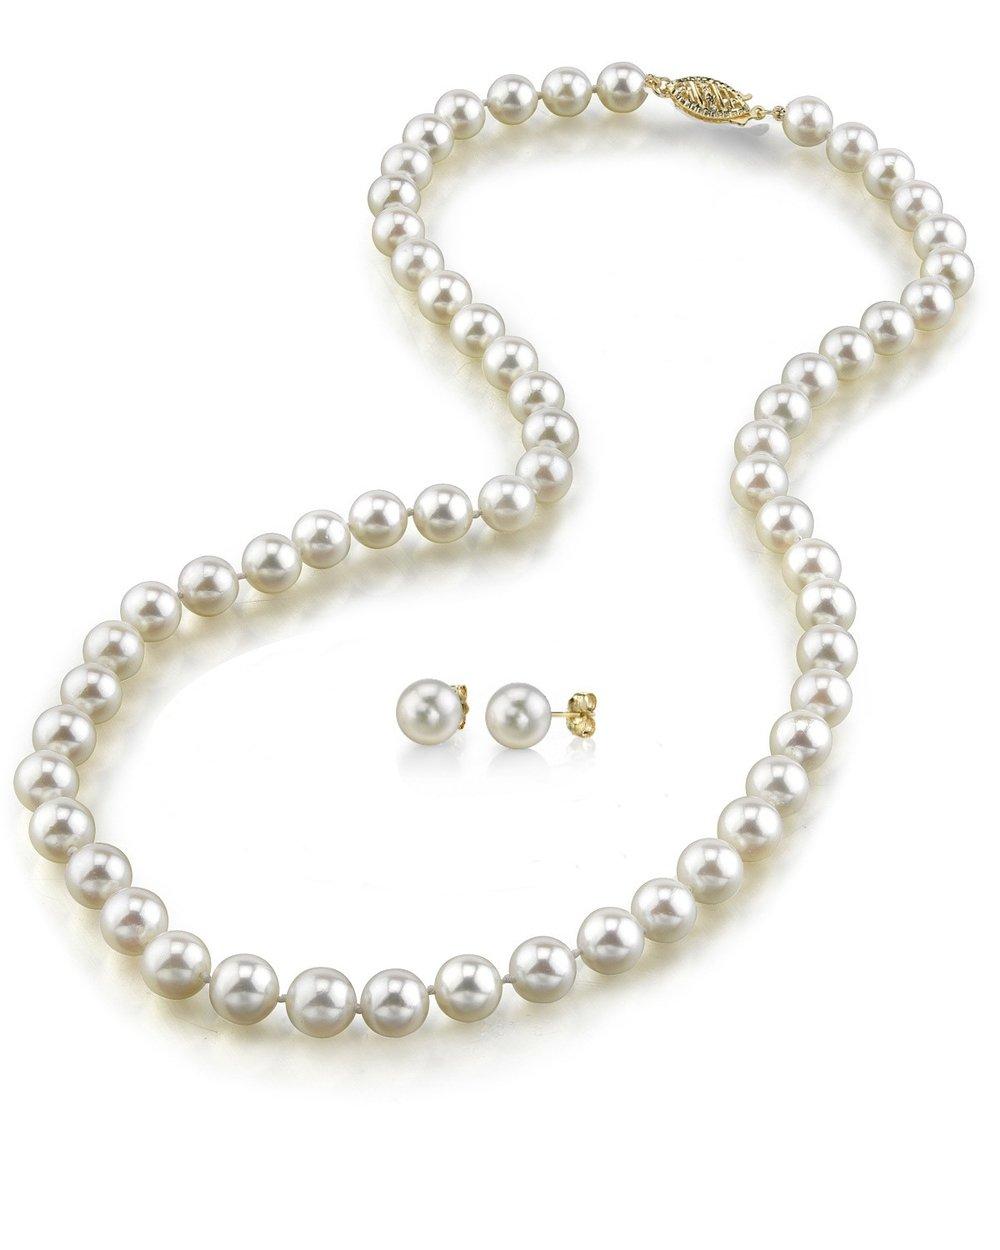 7 8mm freshwater pearl necklace earrings